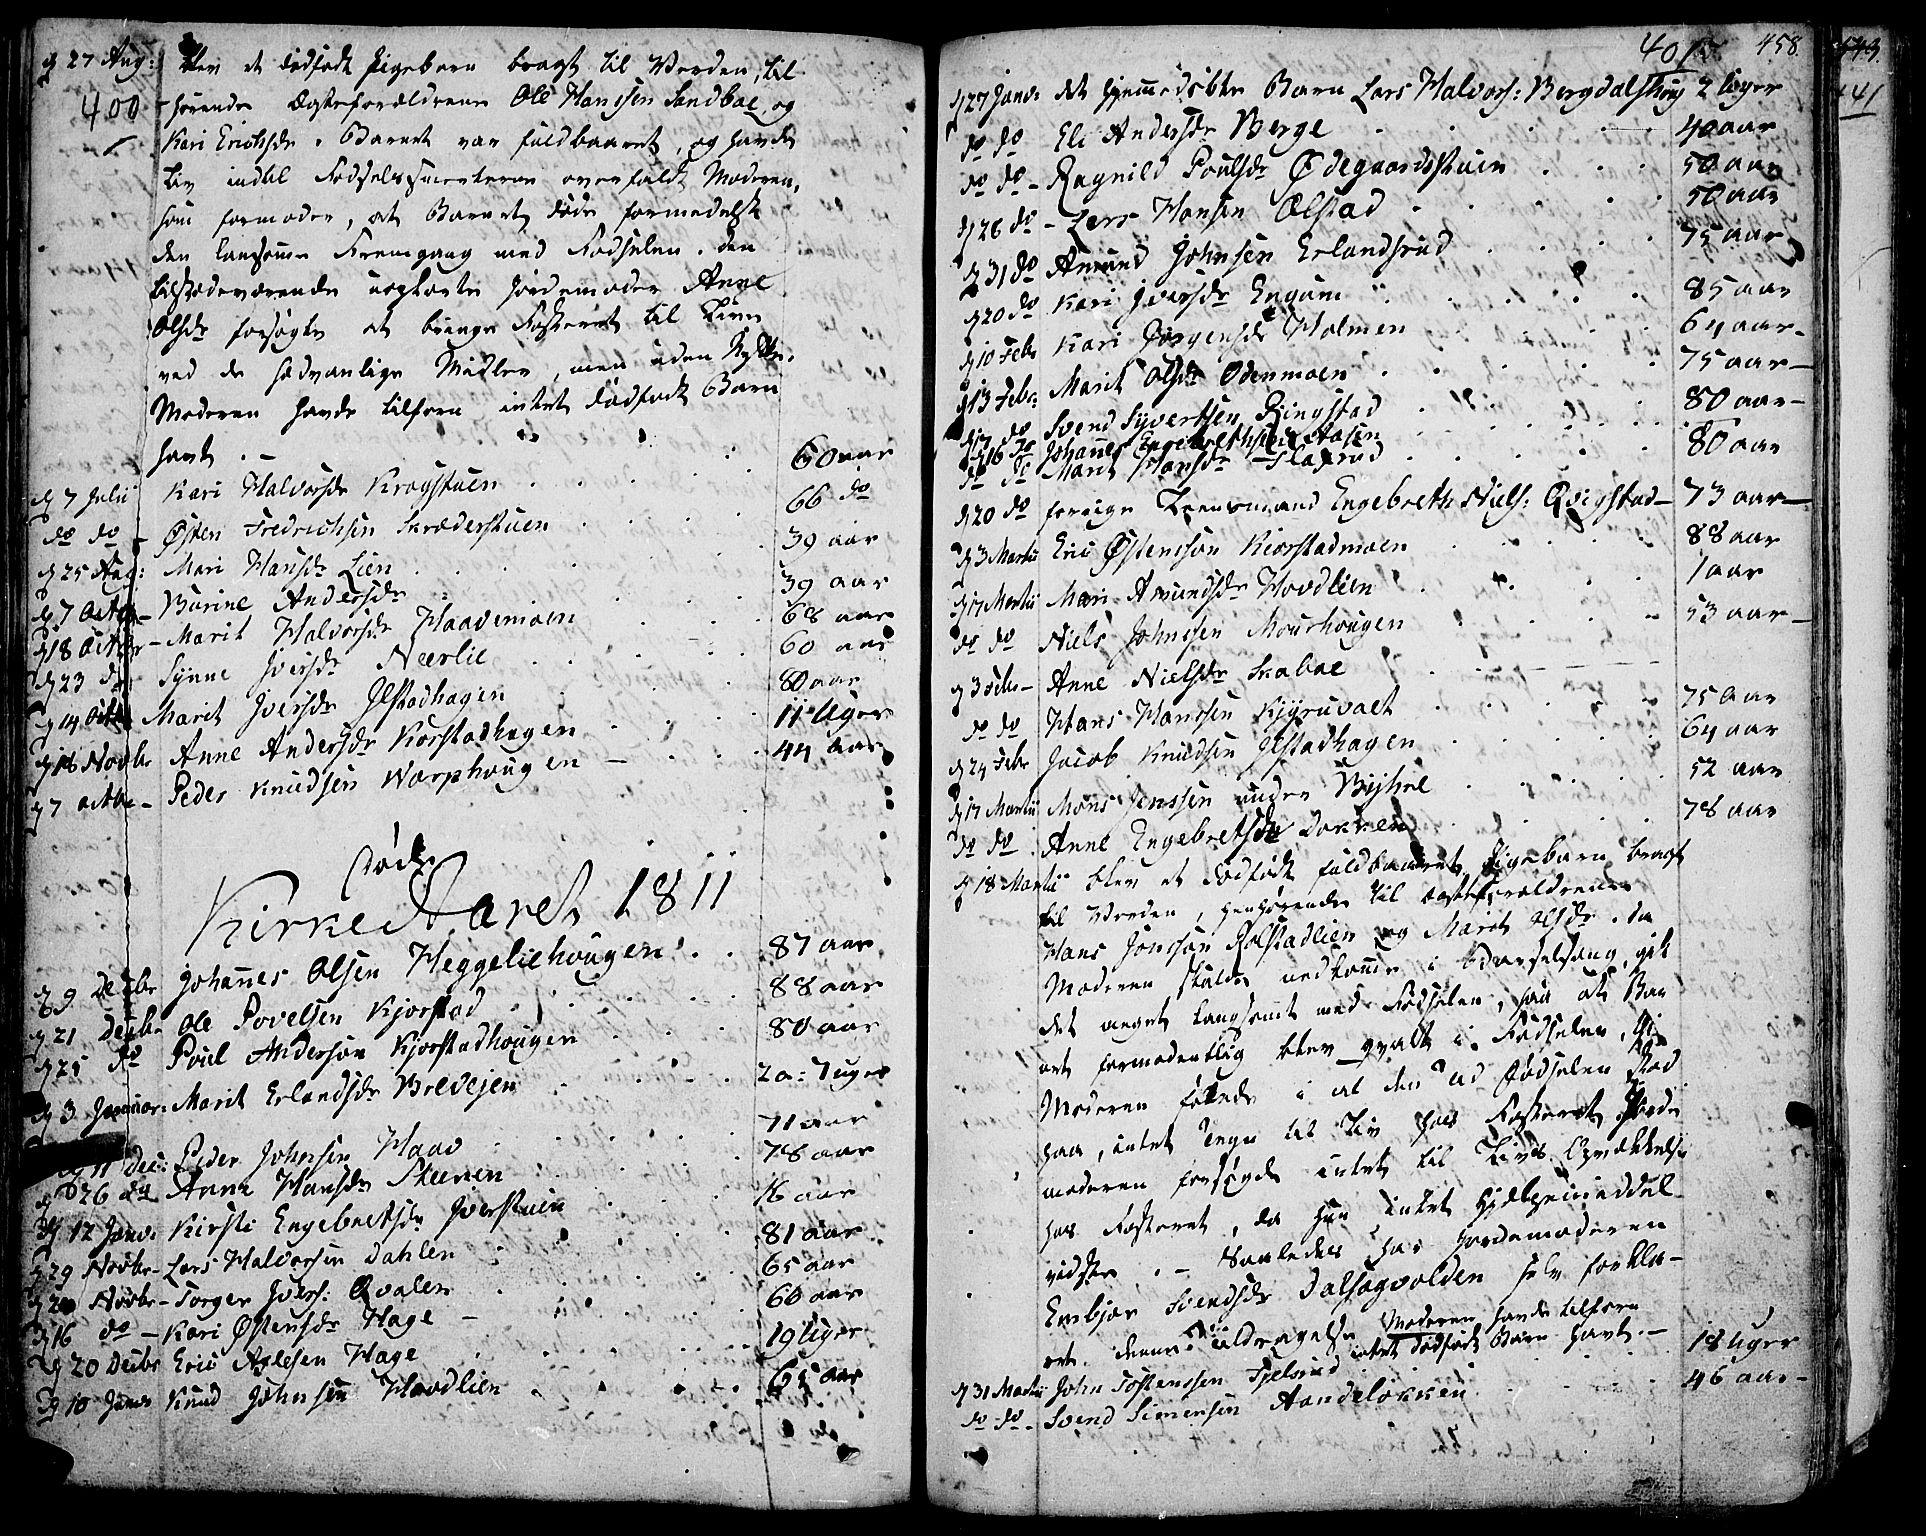 SAH, Fron prestekontor, H/Ha/Haa/L0001: Ministerialbok nr. 1, 1799-1816, s. 400-401